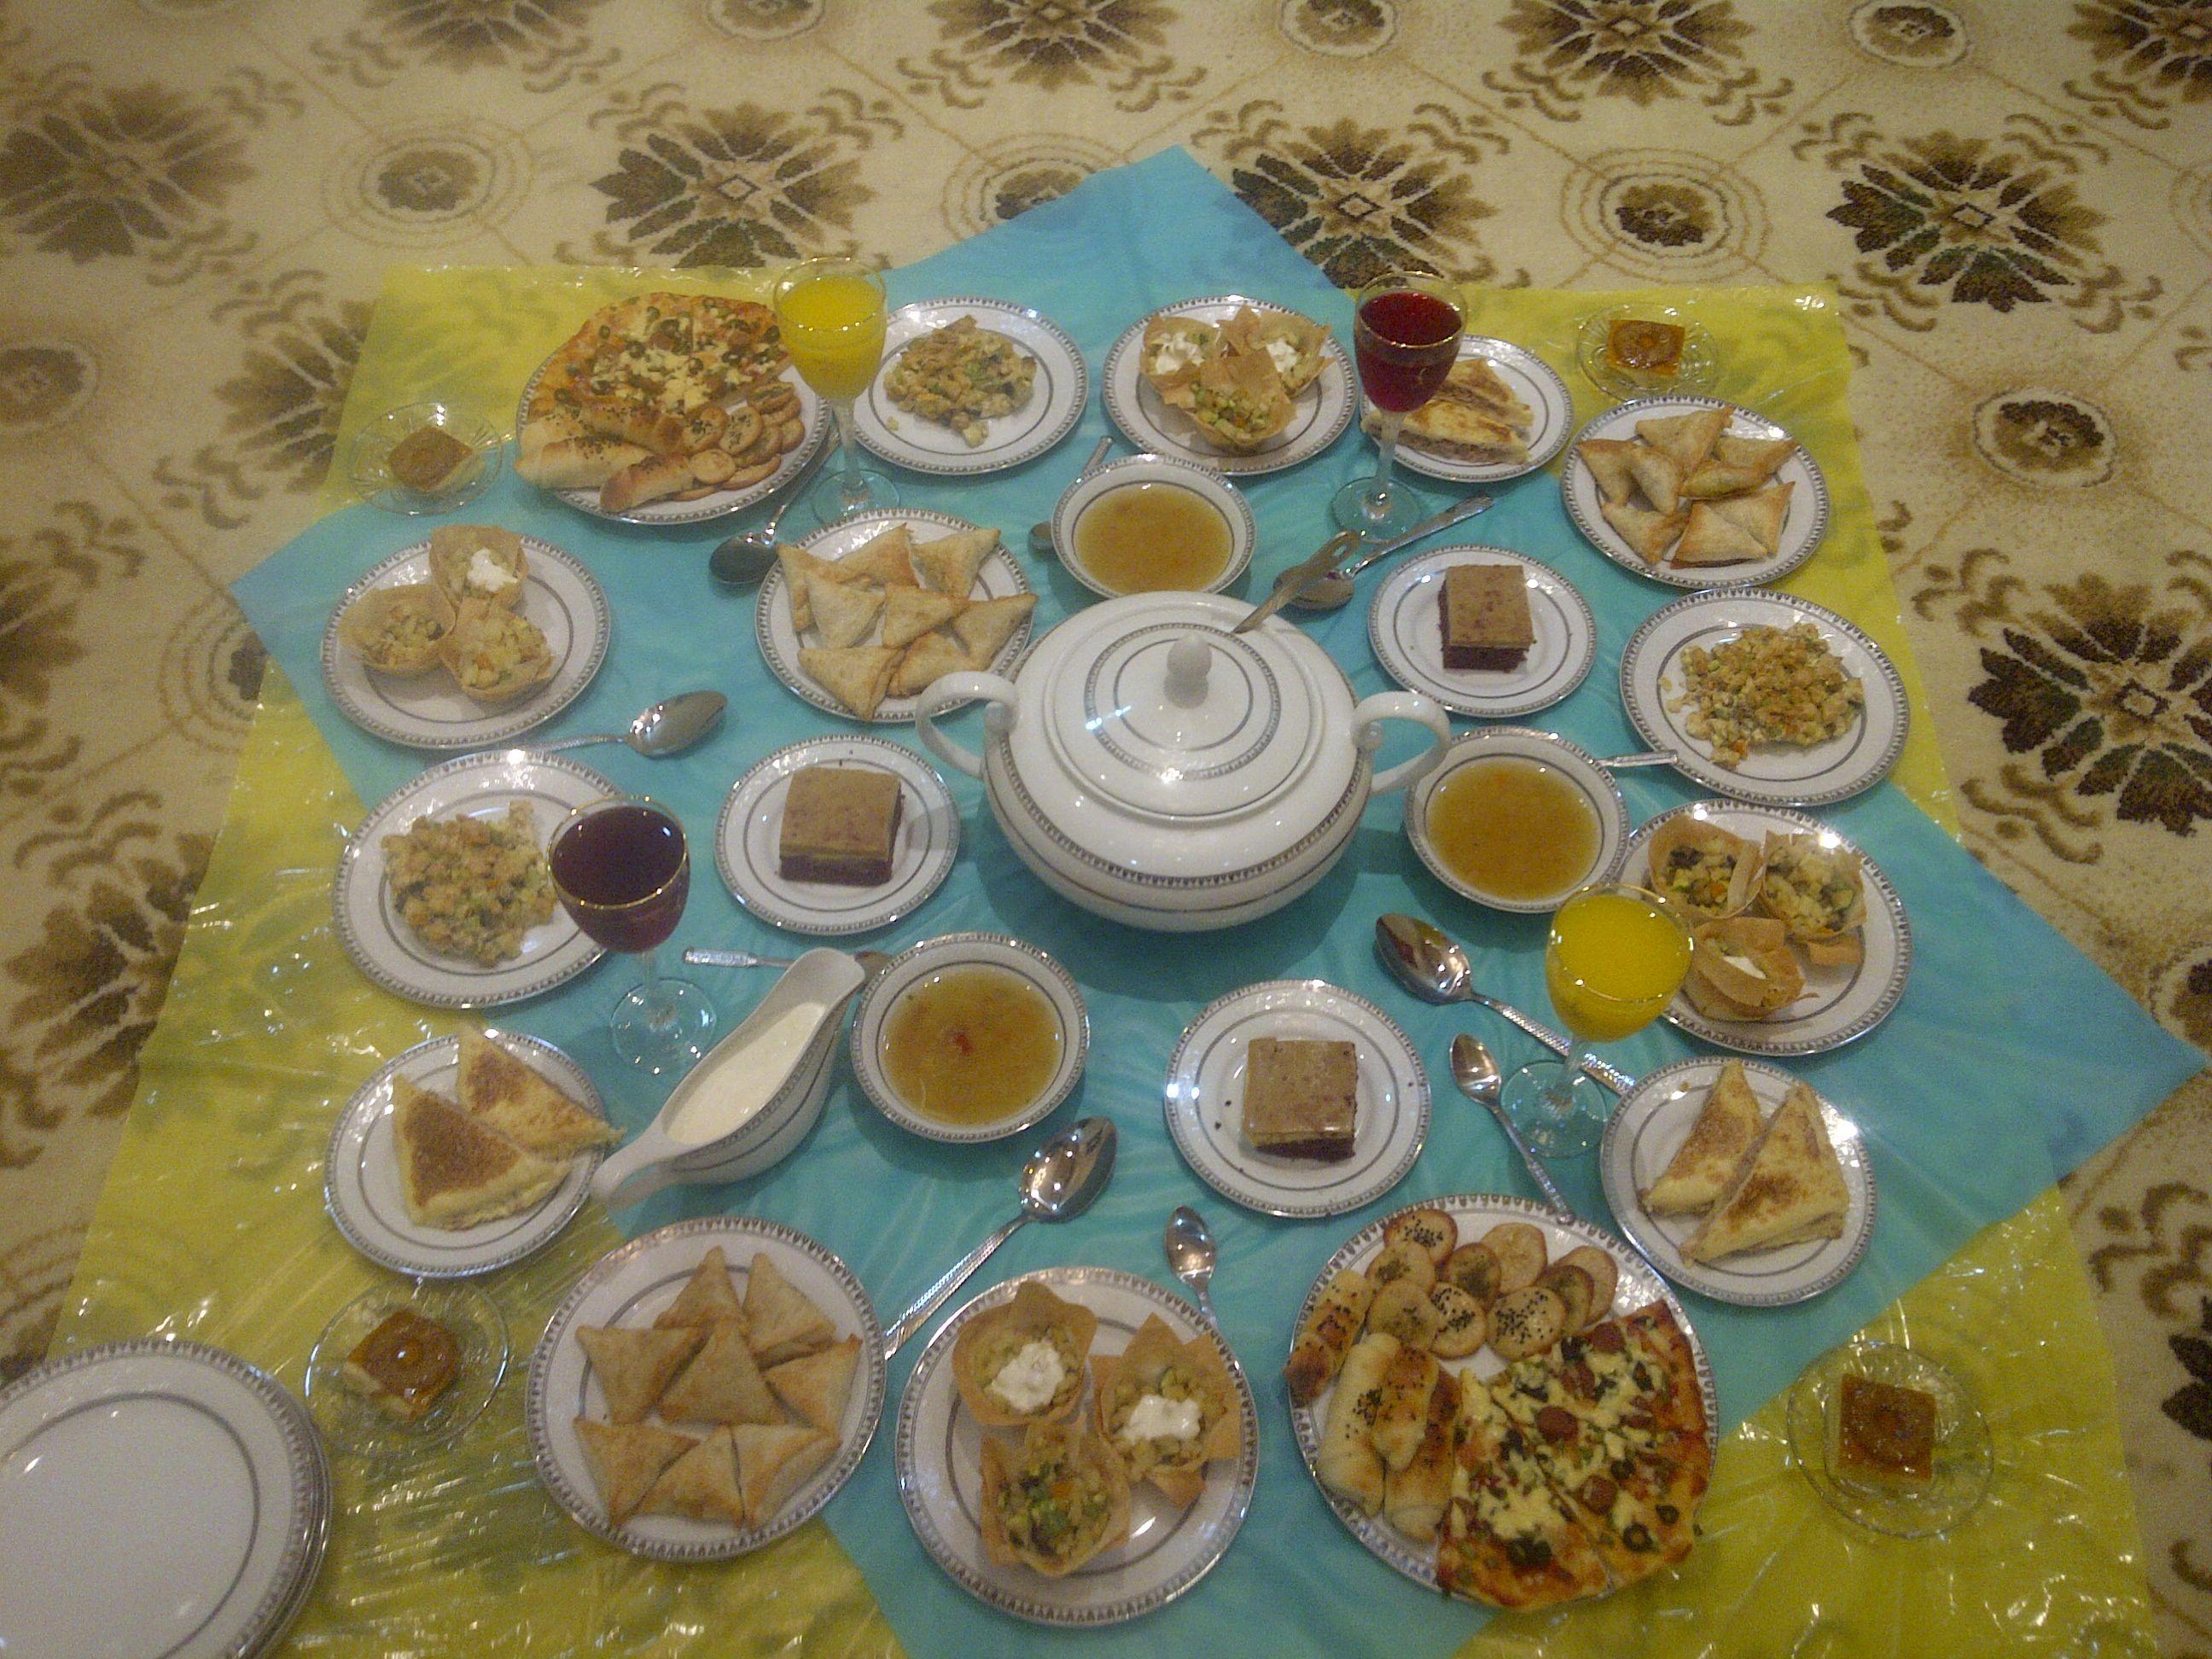 2d0d1f15d1787 اليكم اشكال مختلفة ورائعة من سفرة رمضان 2017